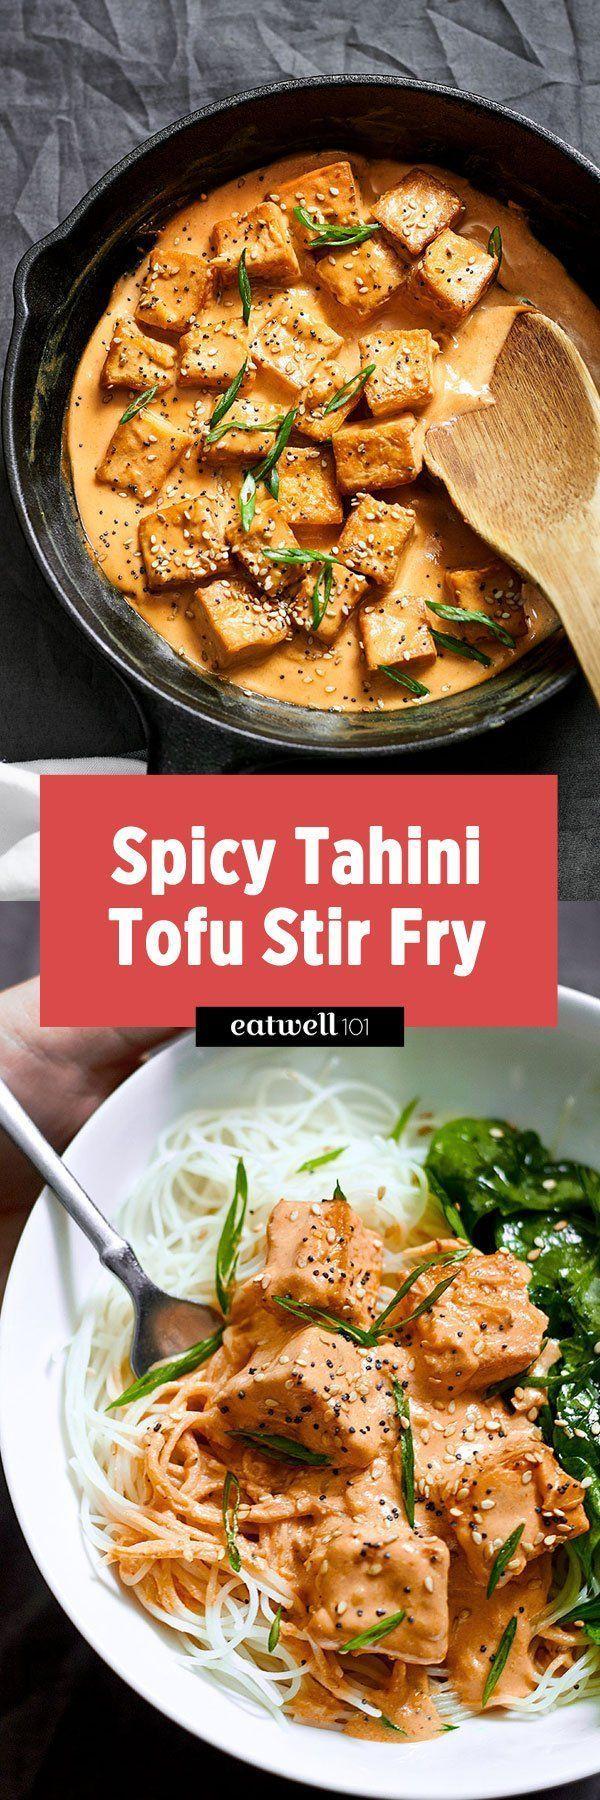 Spicy Tahini Tofu Stir Fry